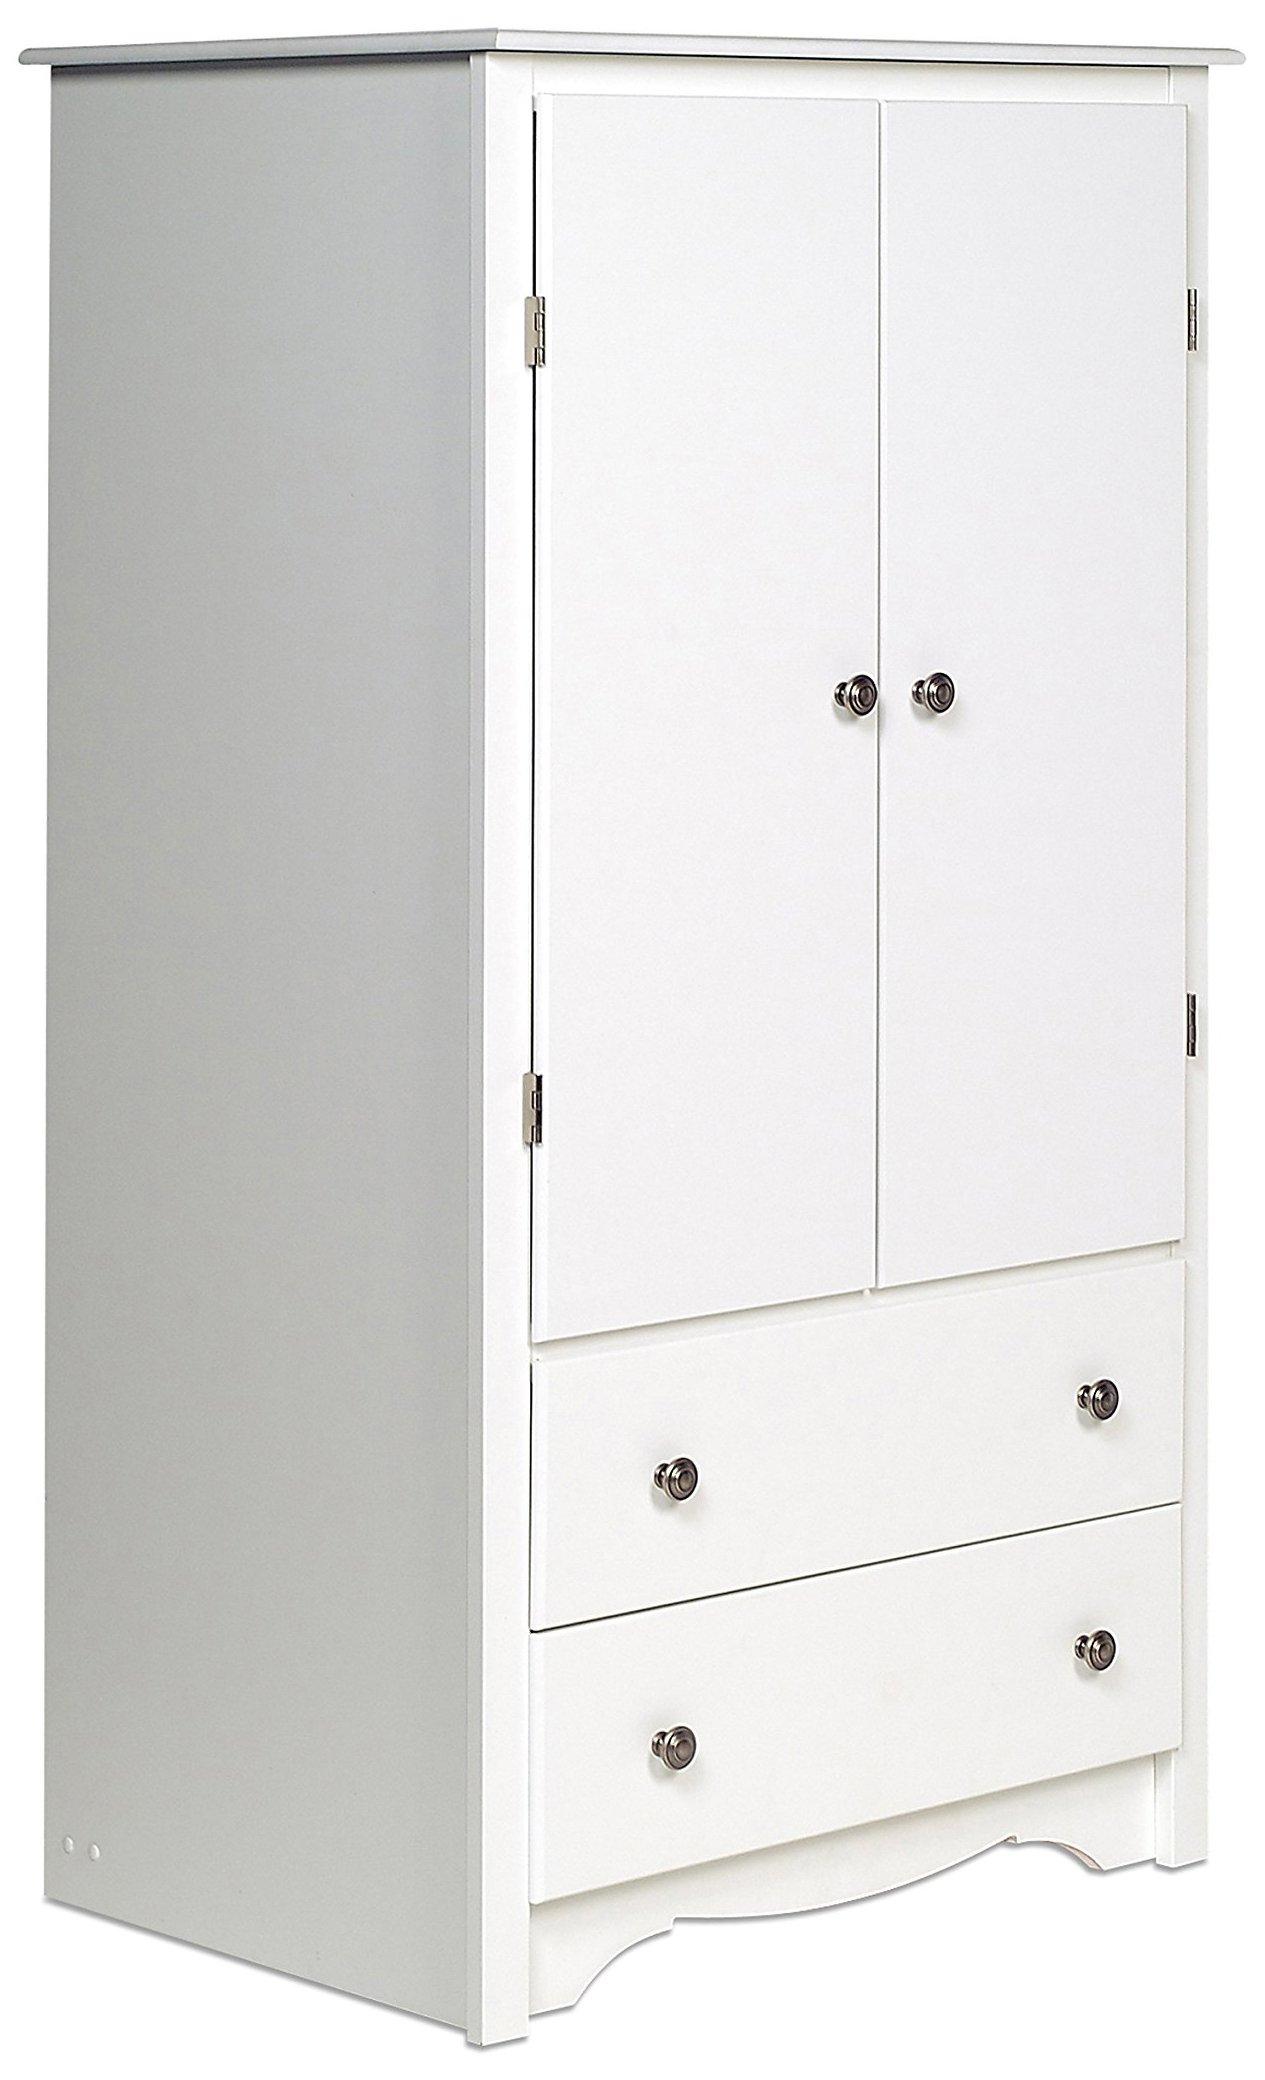 Prepac White Monterey 2 Door Armoire by Prepac